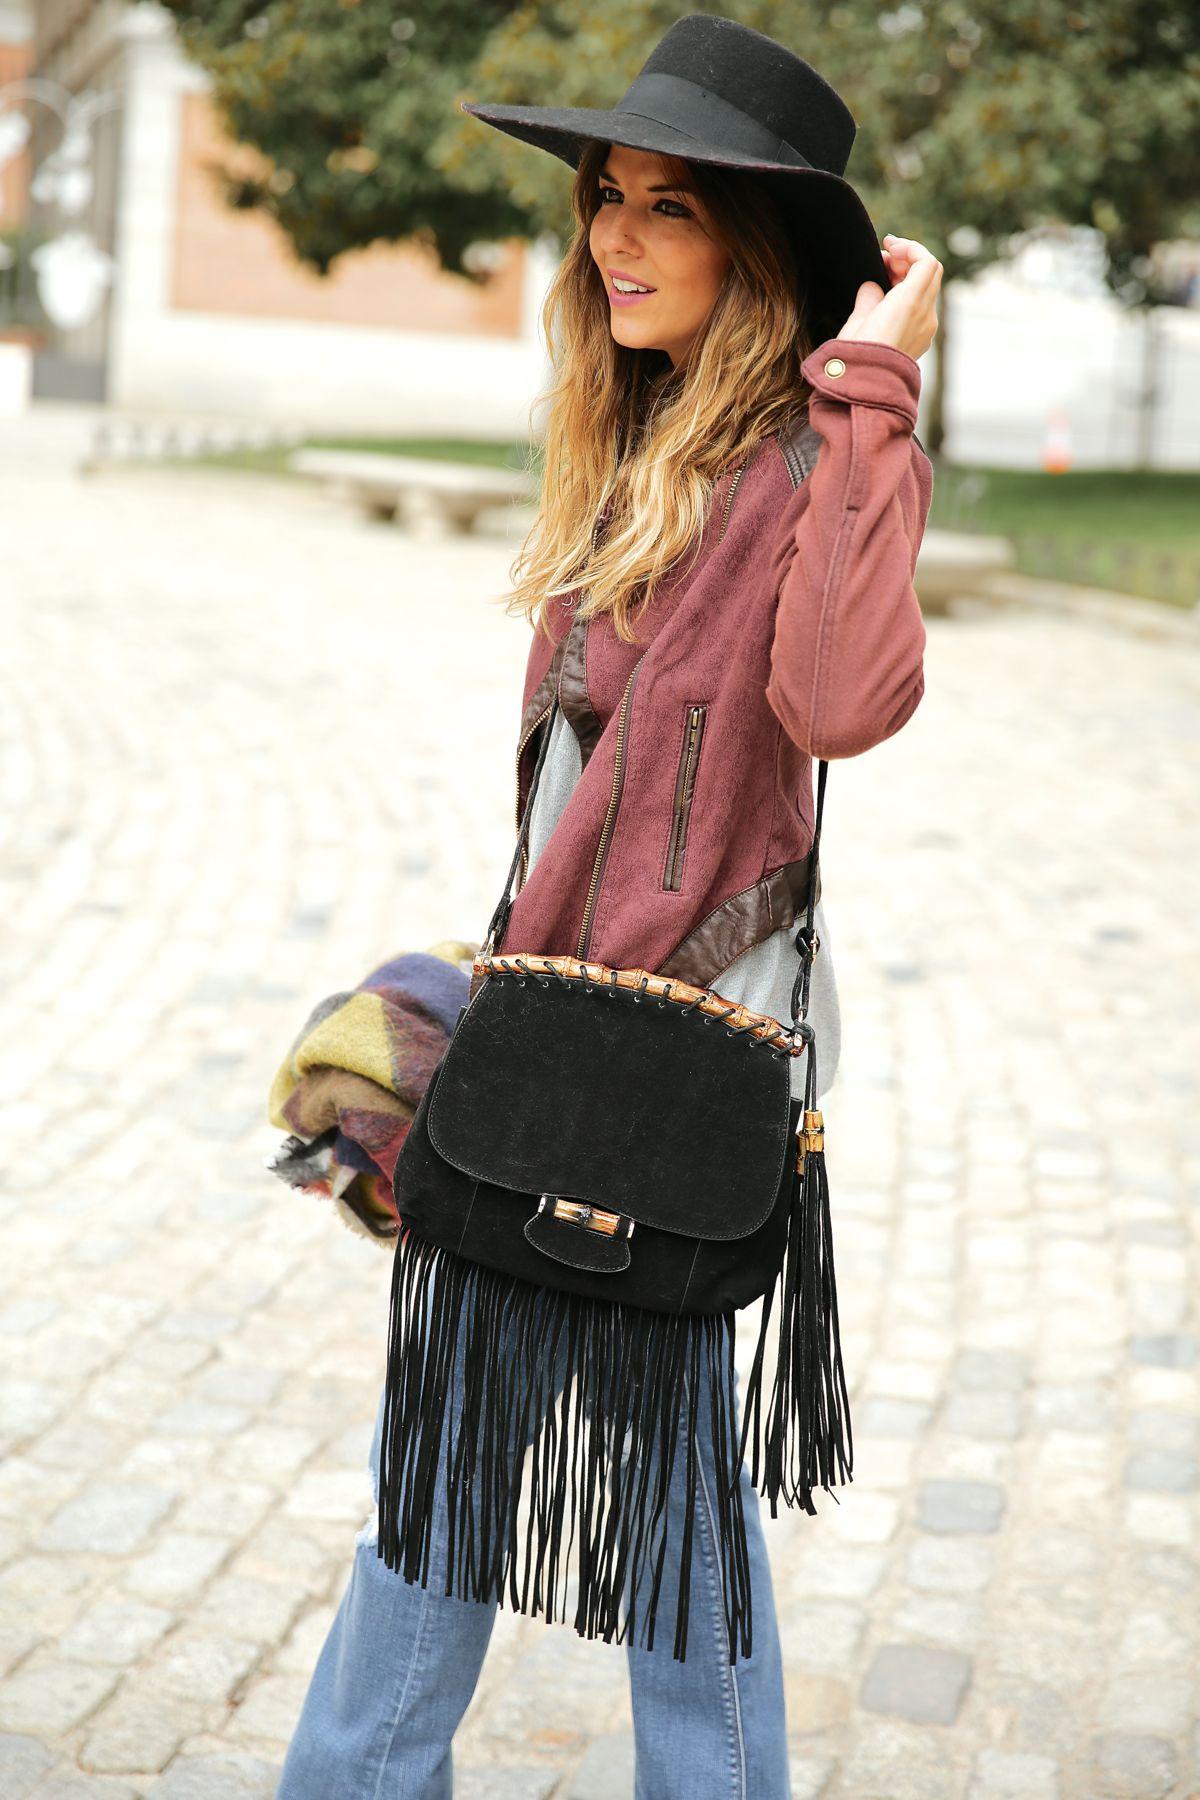 trendy_taste-look-outfit-street_style-ootd-blog-blogger-fashion_spain-moda_españa-AD-adolfo_dominguez-amaia_salamanca-boho-hippie-sombrero-hat-biker-flecos-fringes-2